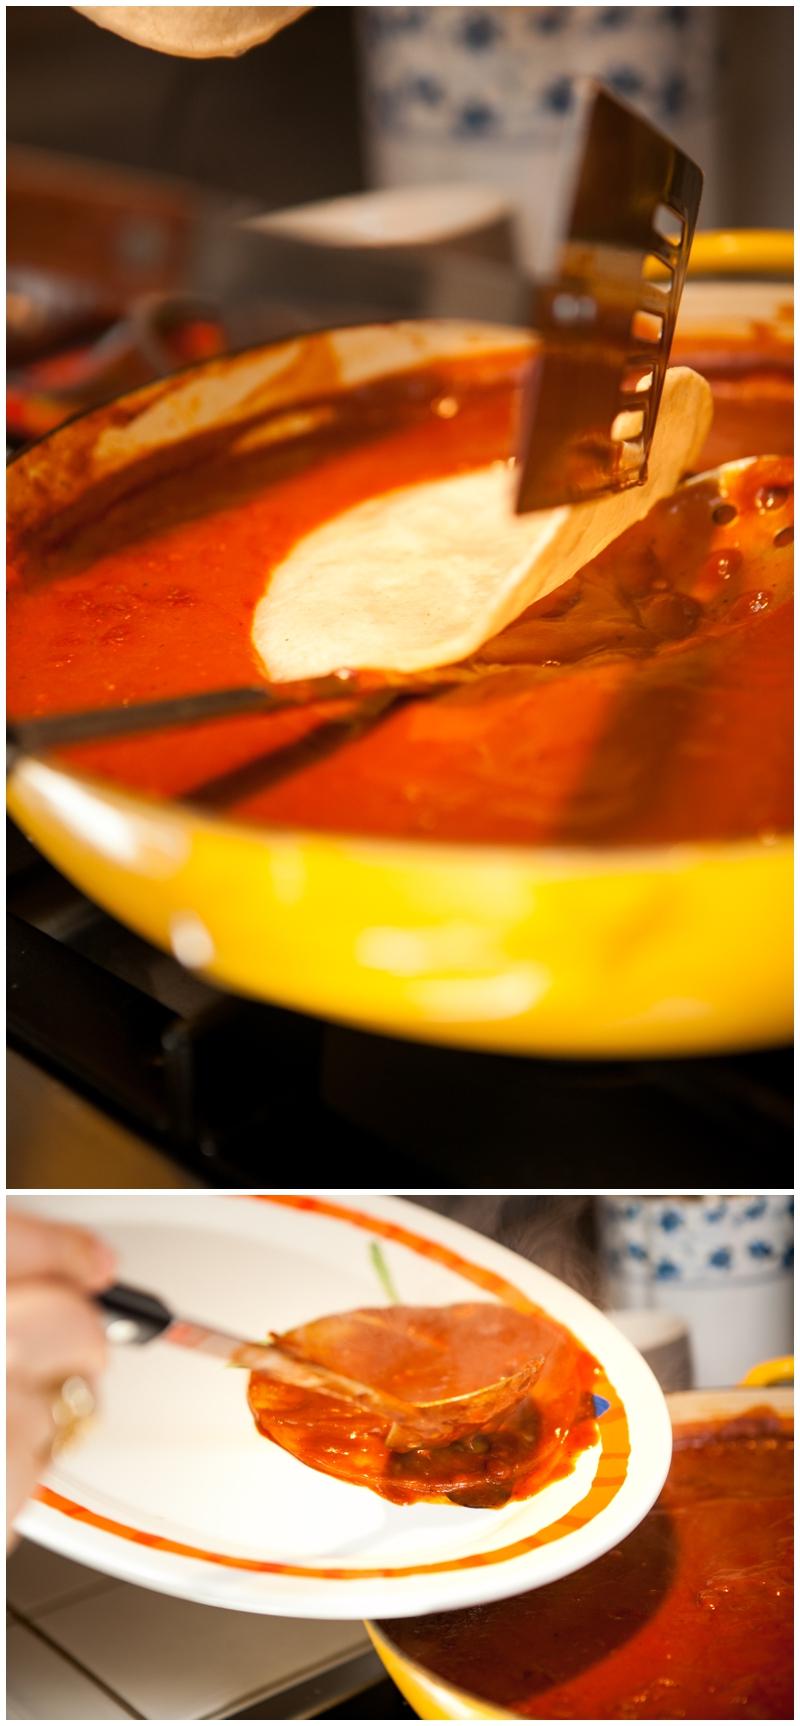 Food-Love-Tradition_25.jpg